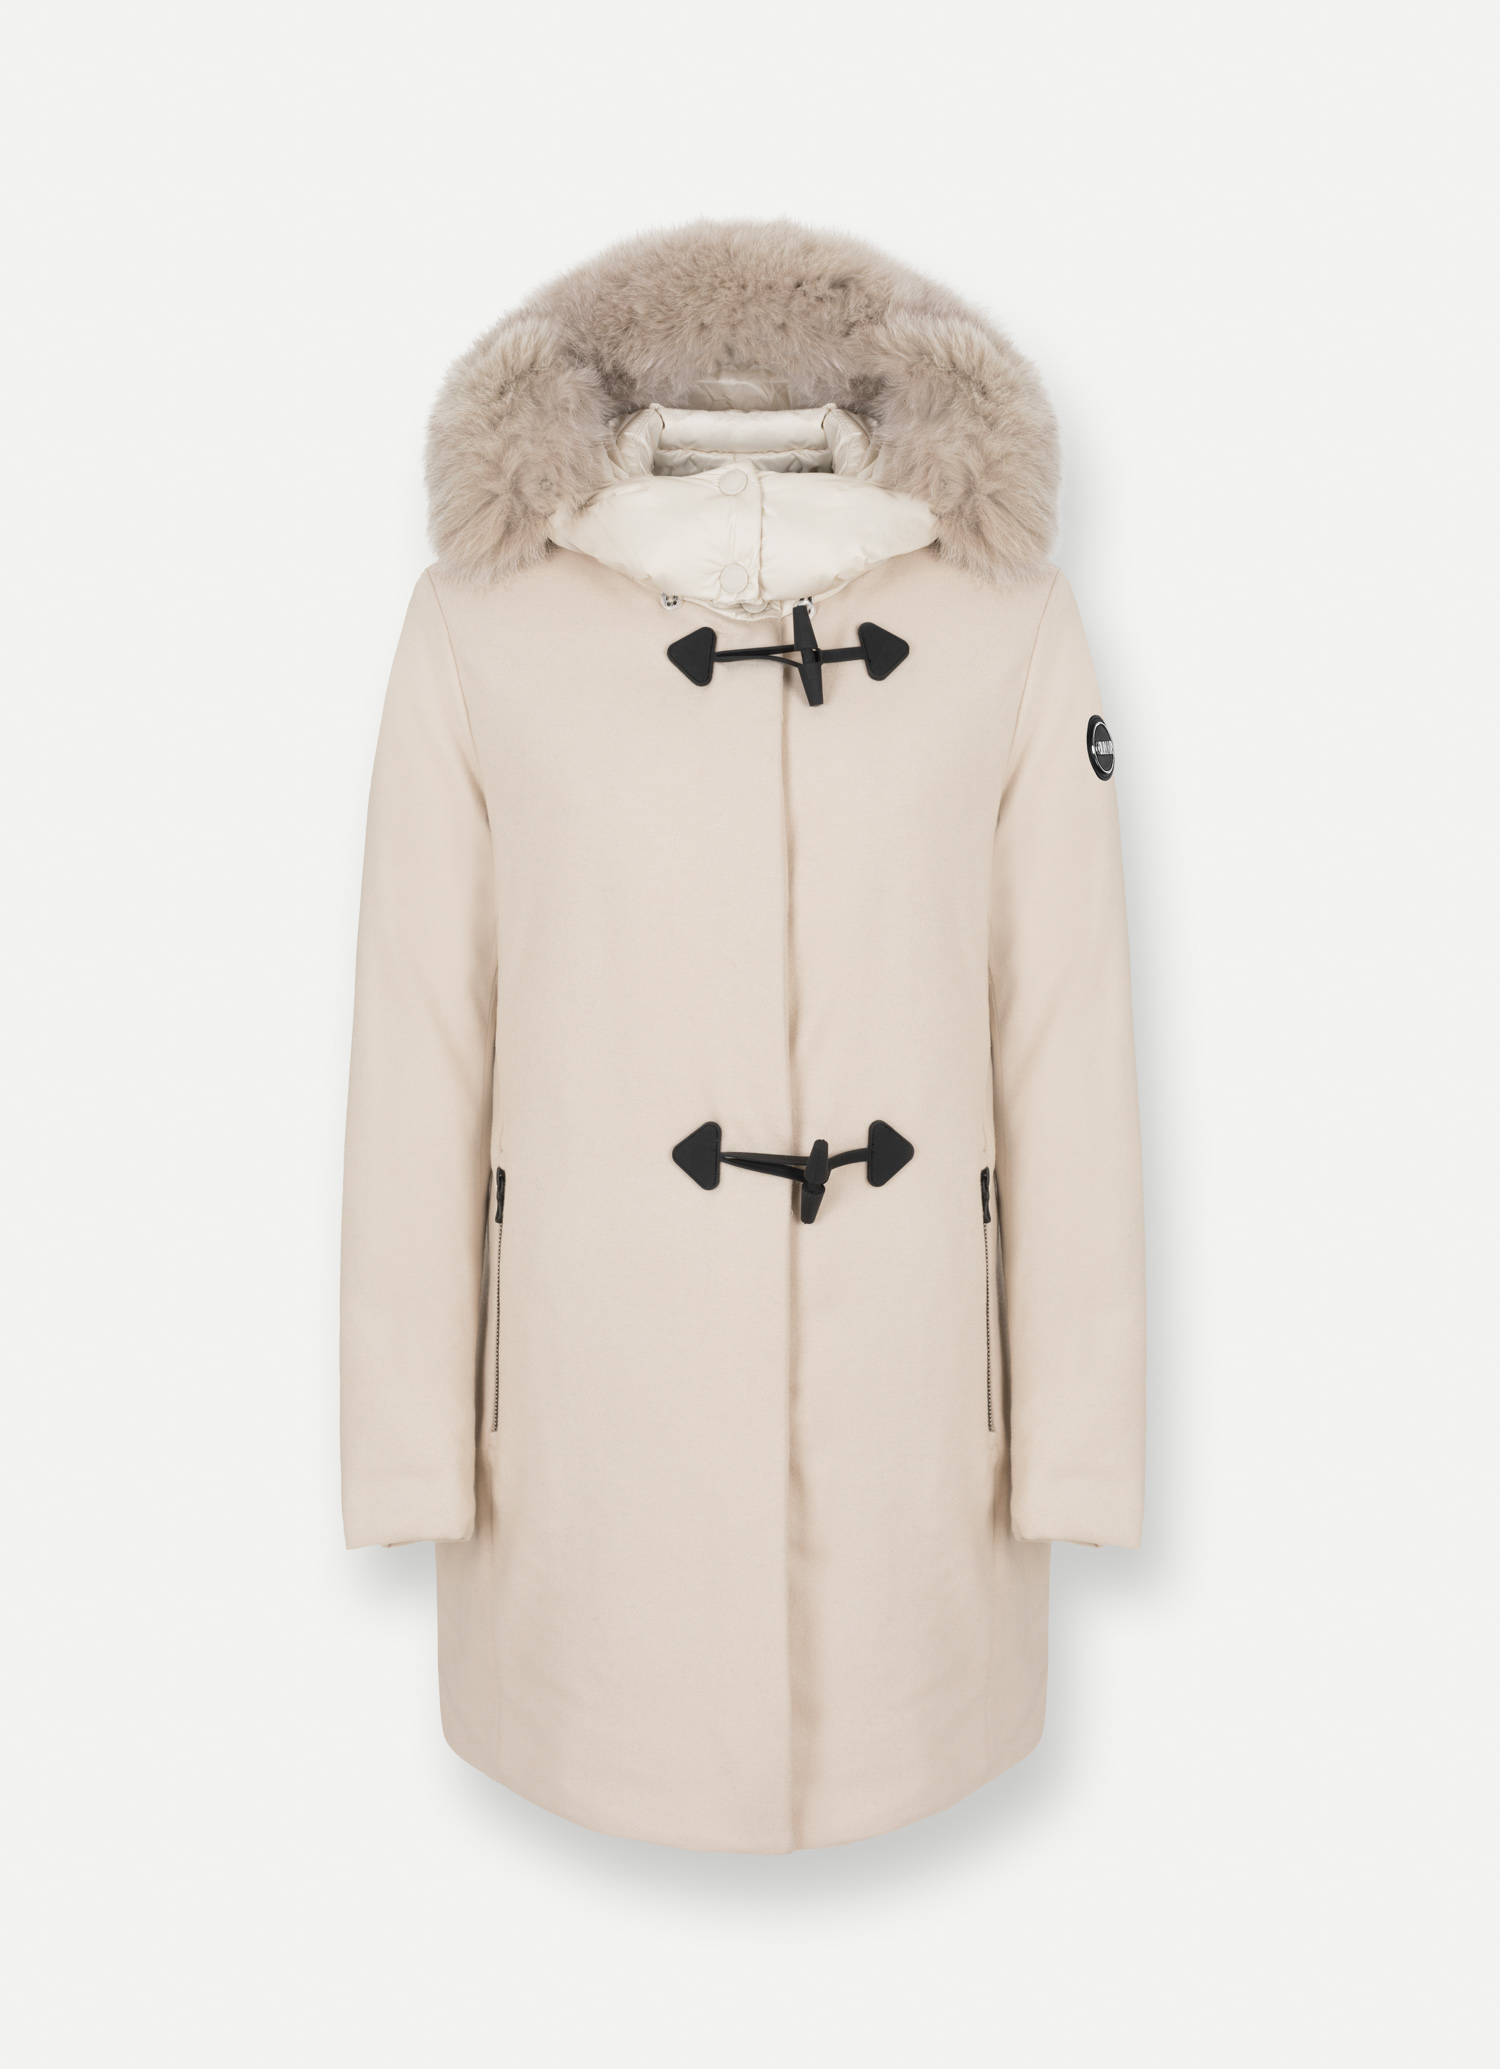 quality design 908a2 a9548 Colmar Originals women's woollen fabric long jacket - Colmar